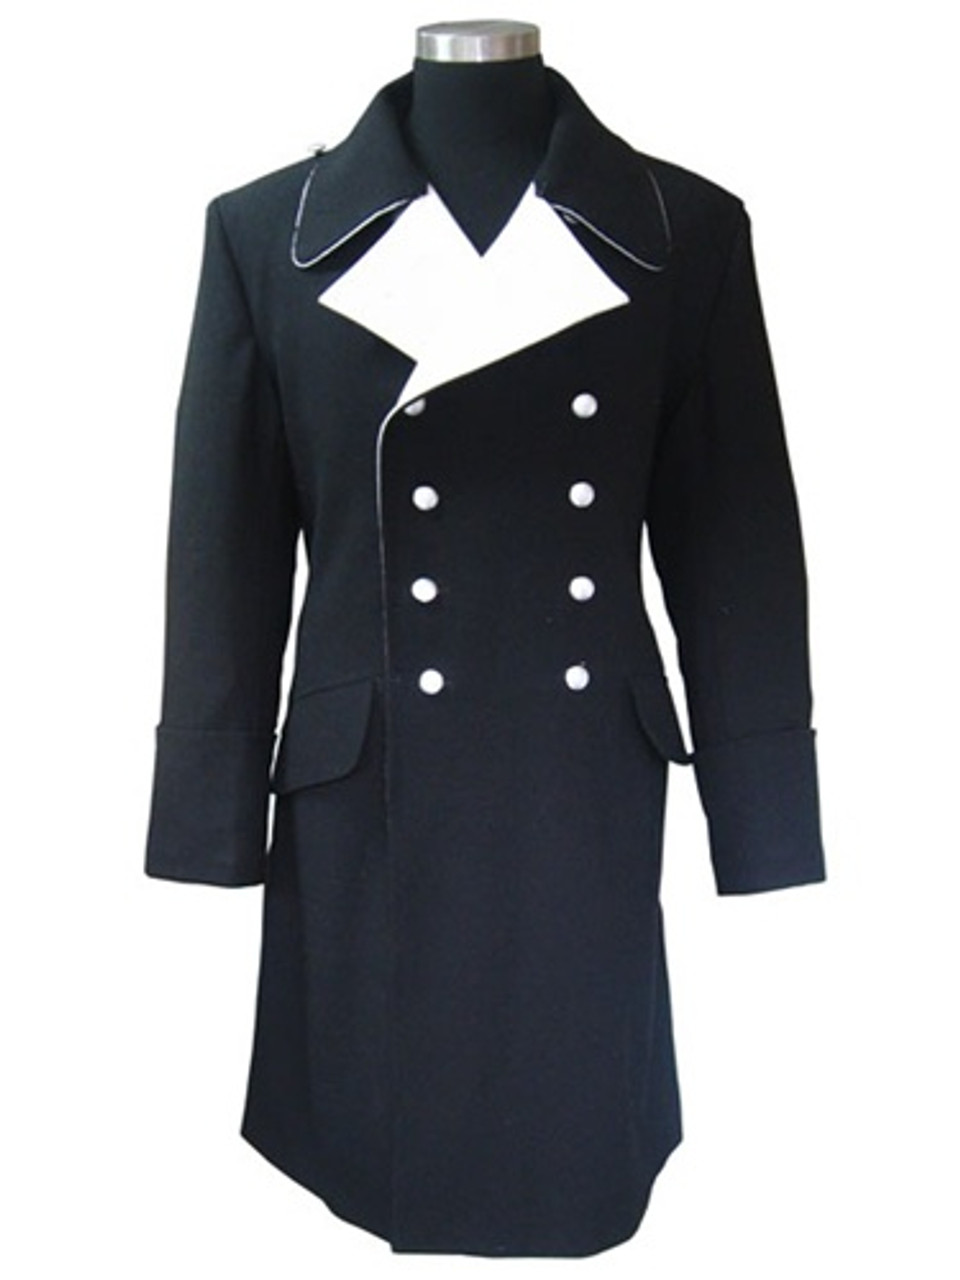 SS M32 General Officer Gabardine Greatcoat from Hessen Antique